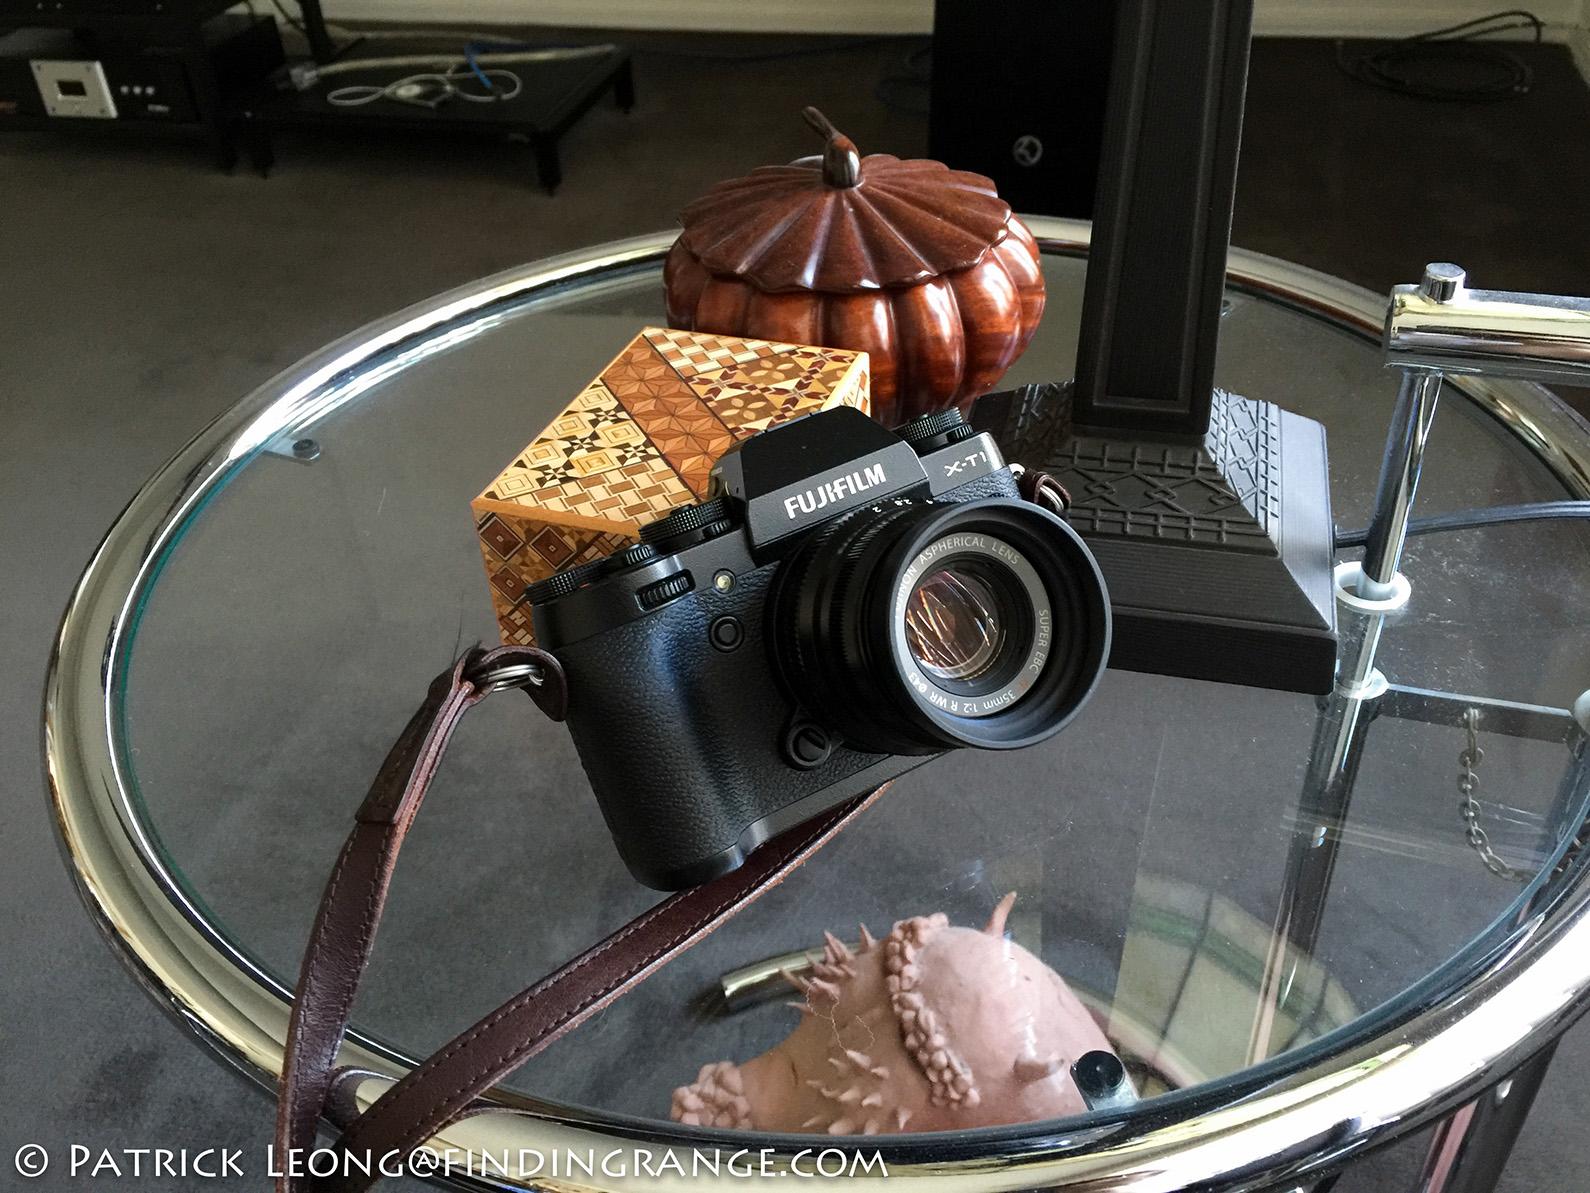 Fuji-XF-35mm-F2-R-WR-Lens-X-T1